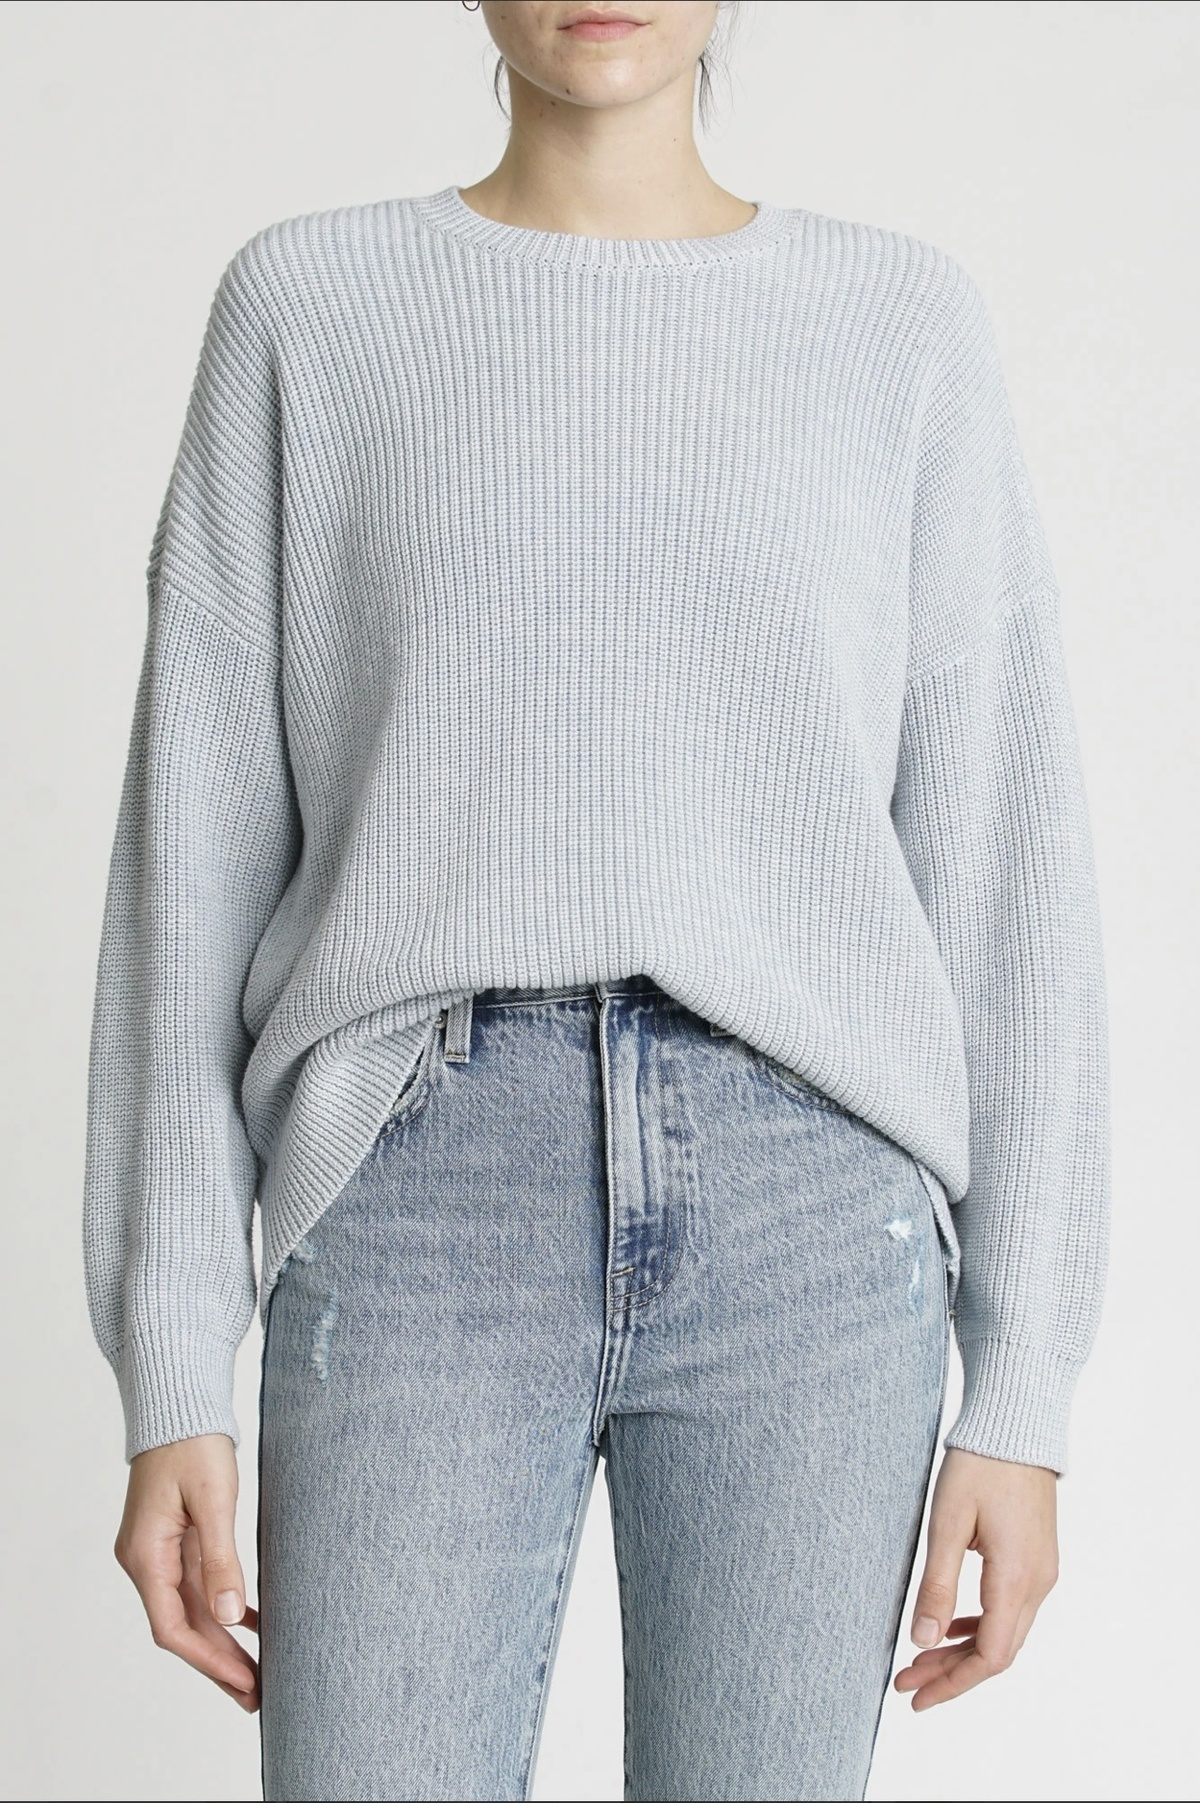 Little Lies Georgia Hand Knit Cardigan | Garmentory